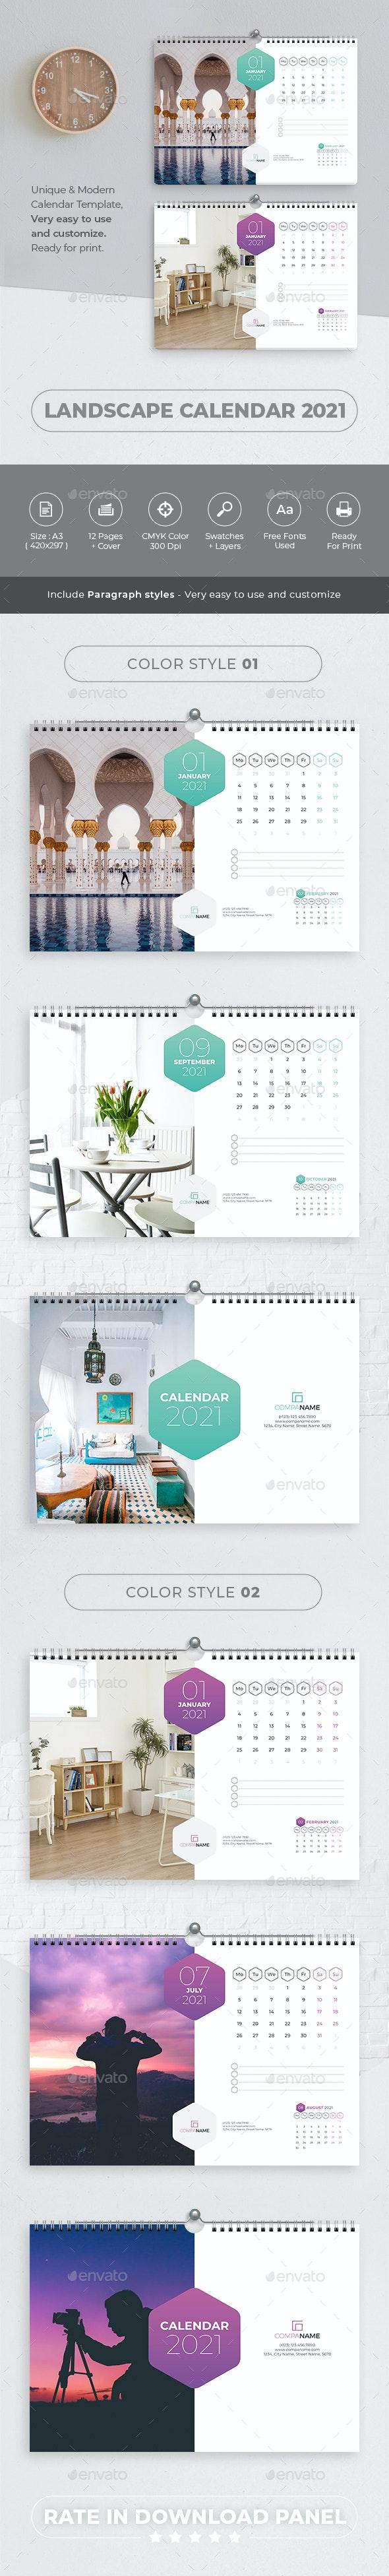 Landscape Calendar 2021 - Calendars Stationery